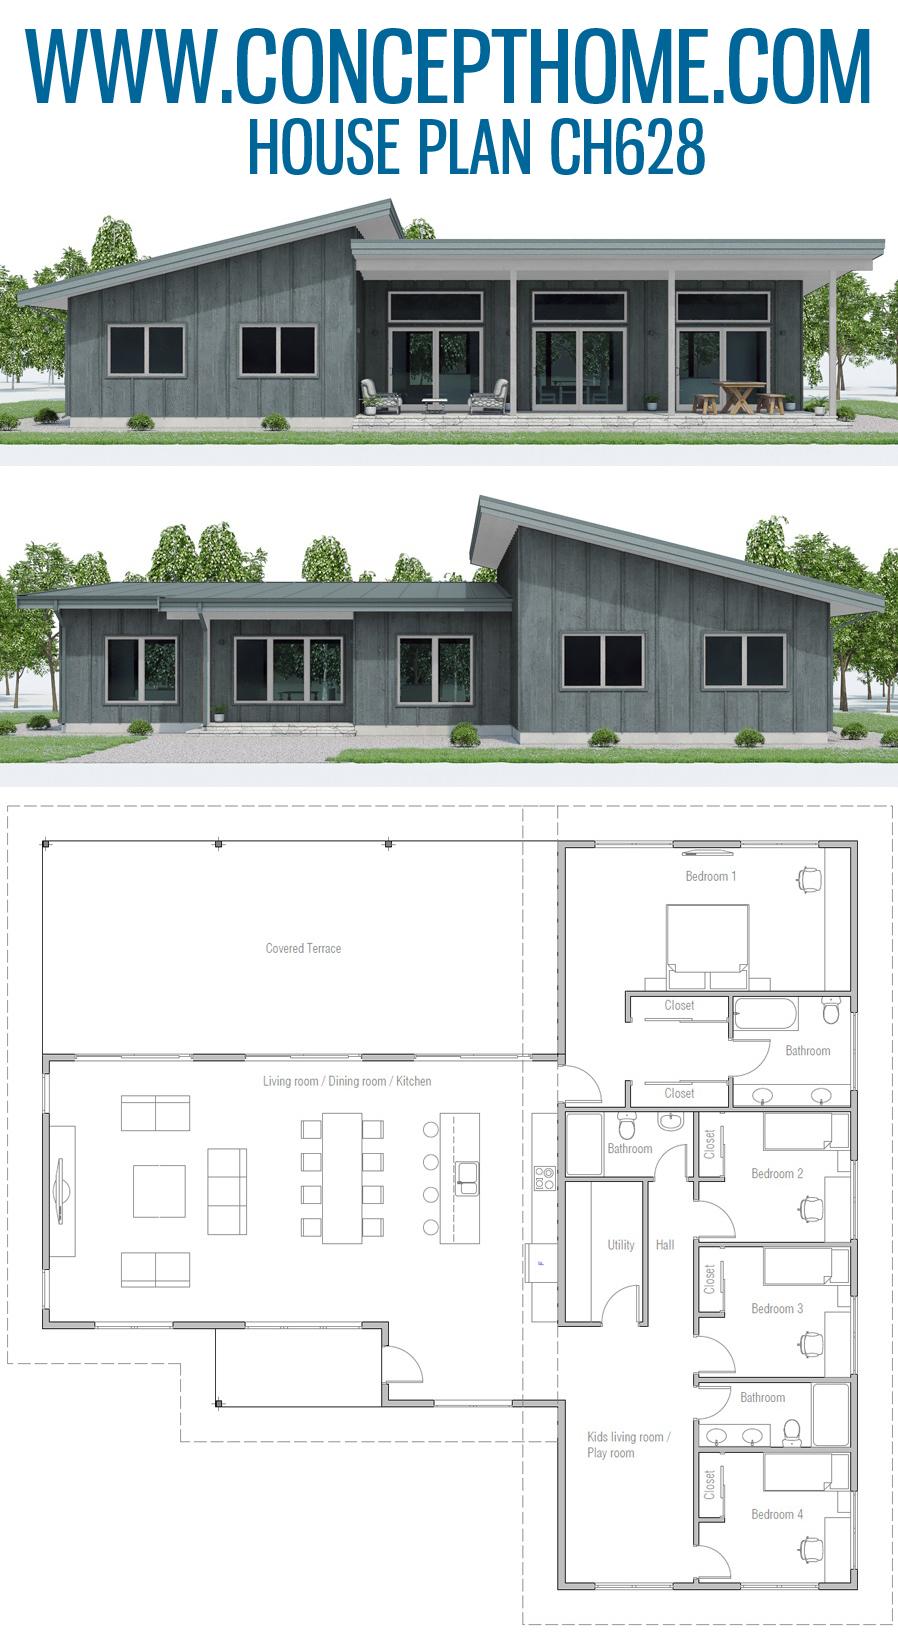 Hausplan Ch628 Home Plans Home Design Floor Plans House Plans Family House Plans